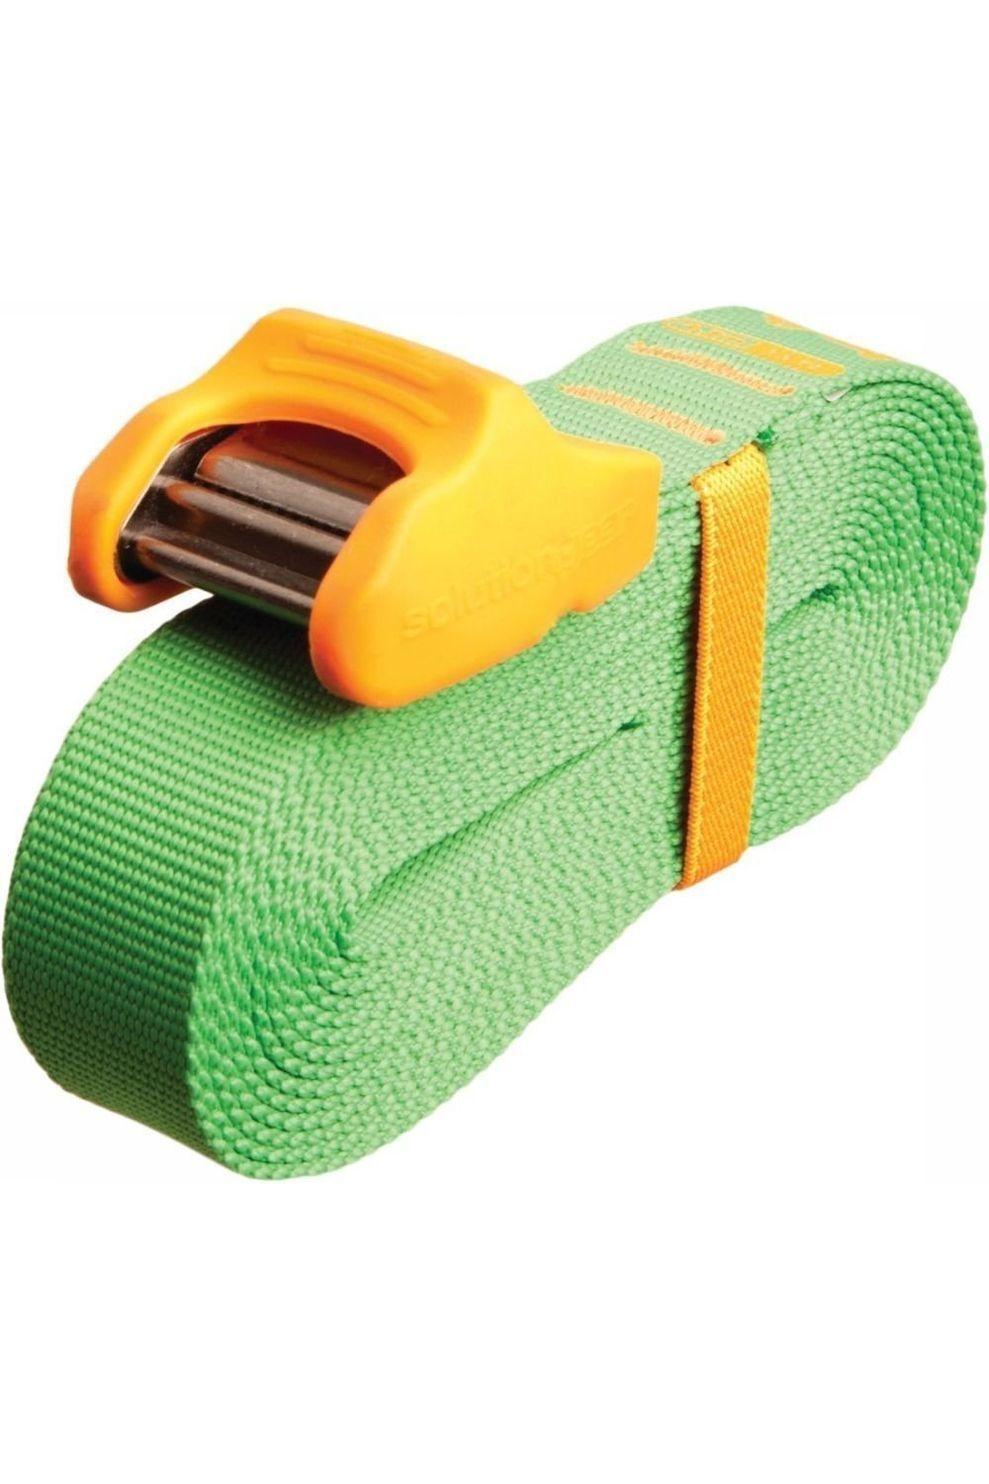 Sea To Summit Spanriem Tie Down Silicone Cam Cover 4.5M 2 Pack Lime/Orange - Limoen Groen/Oranje